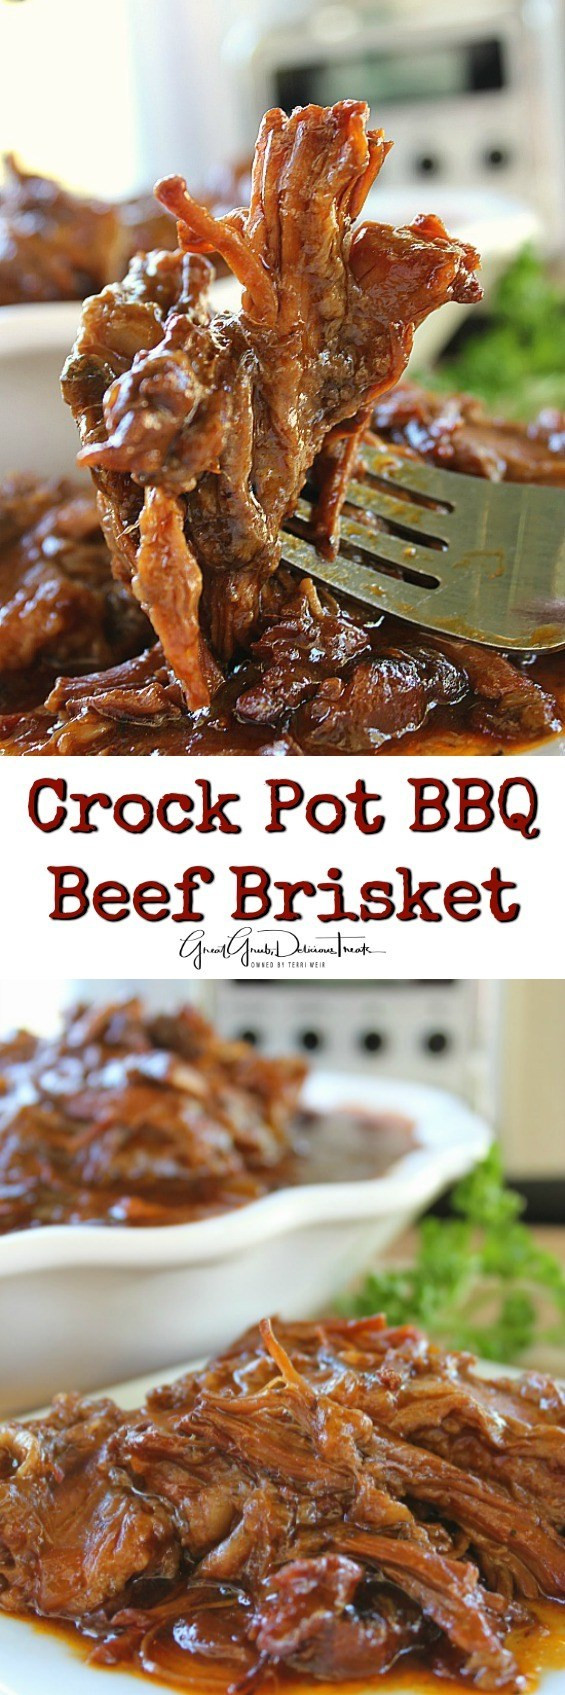 Crock Pot Beef Brisket  Crock Pot BBQ Beef Brisket Great Grub Delicious Treats